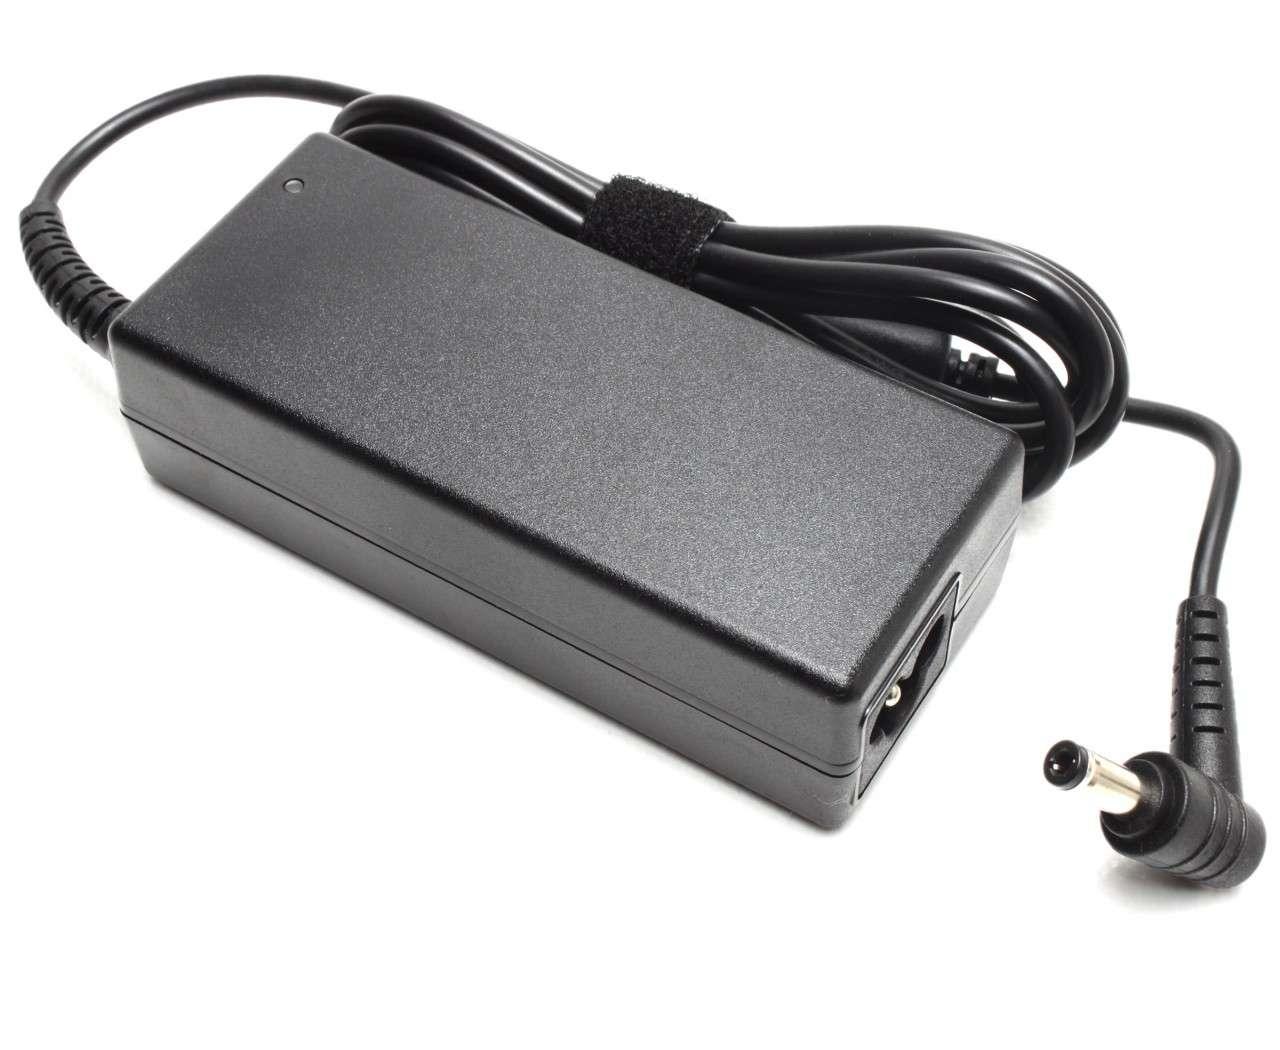 Incarcator Advent K200 imagine powerlaptop.ro 2021